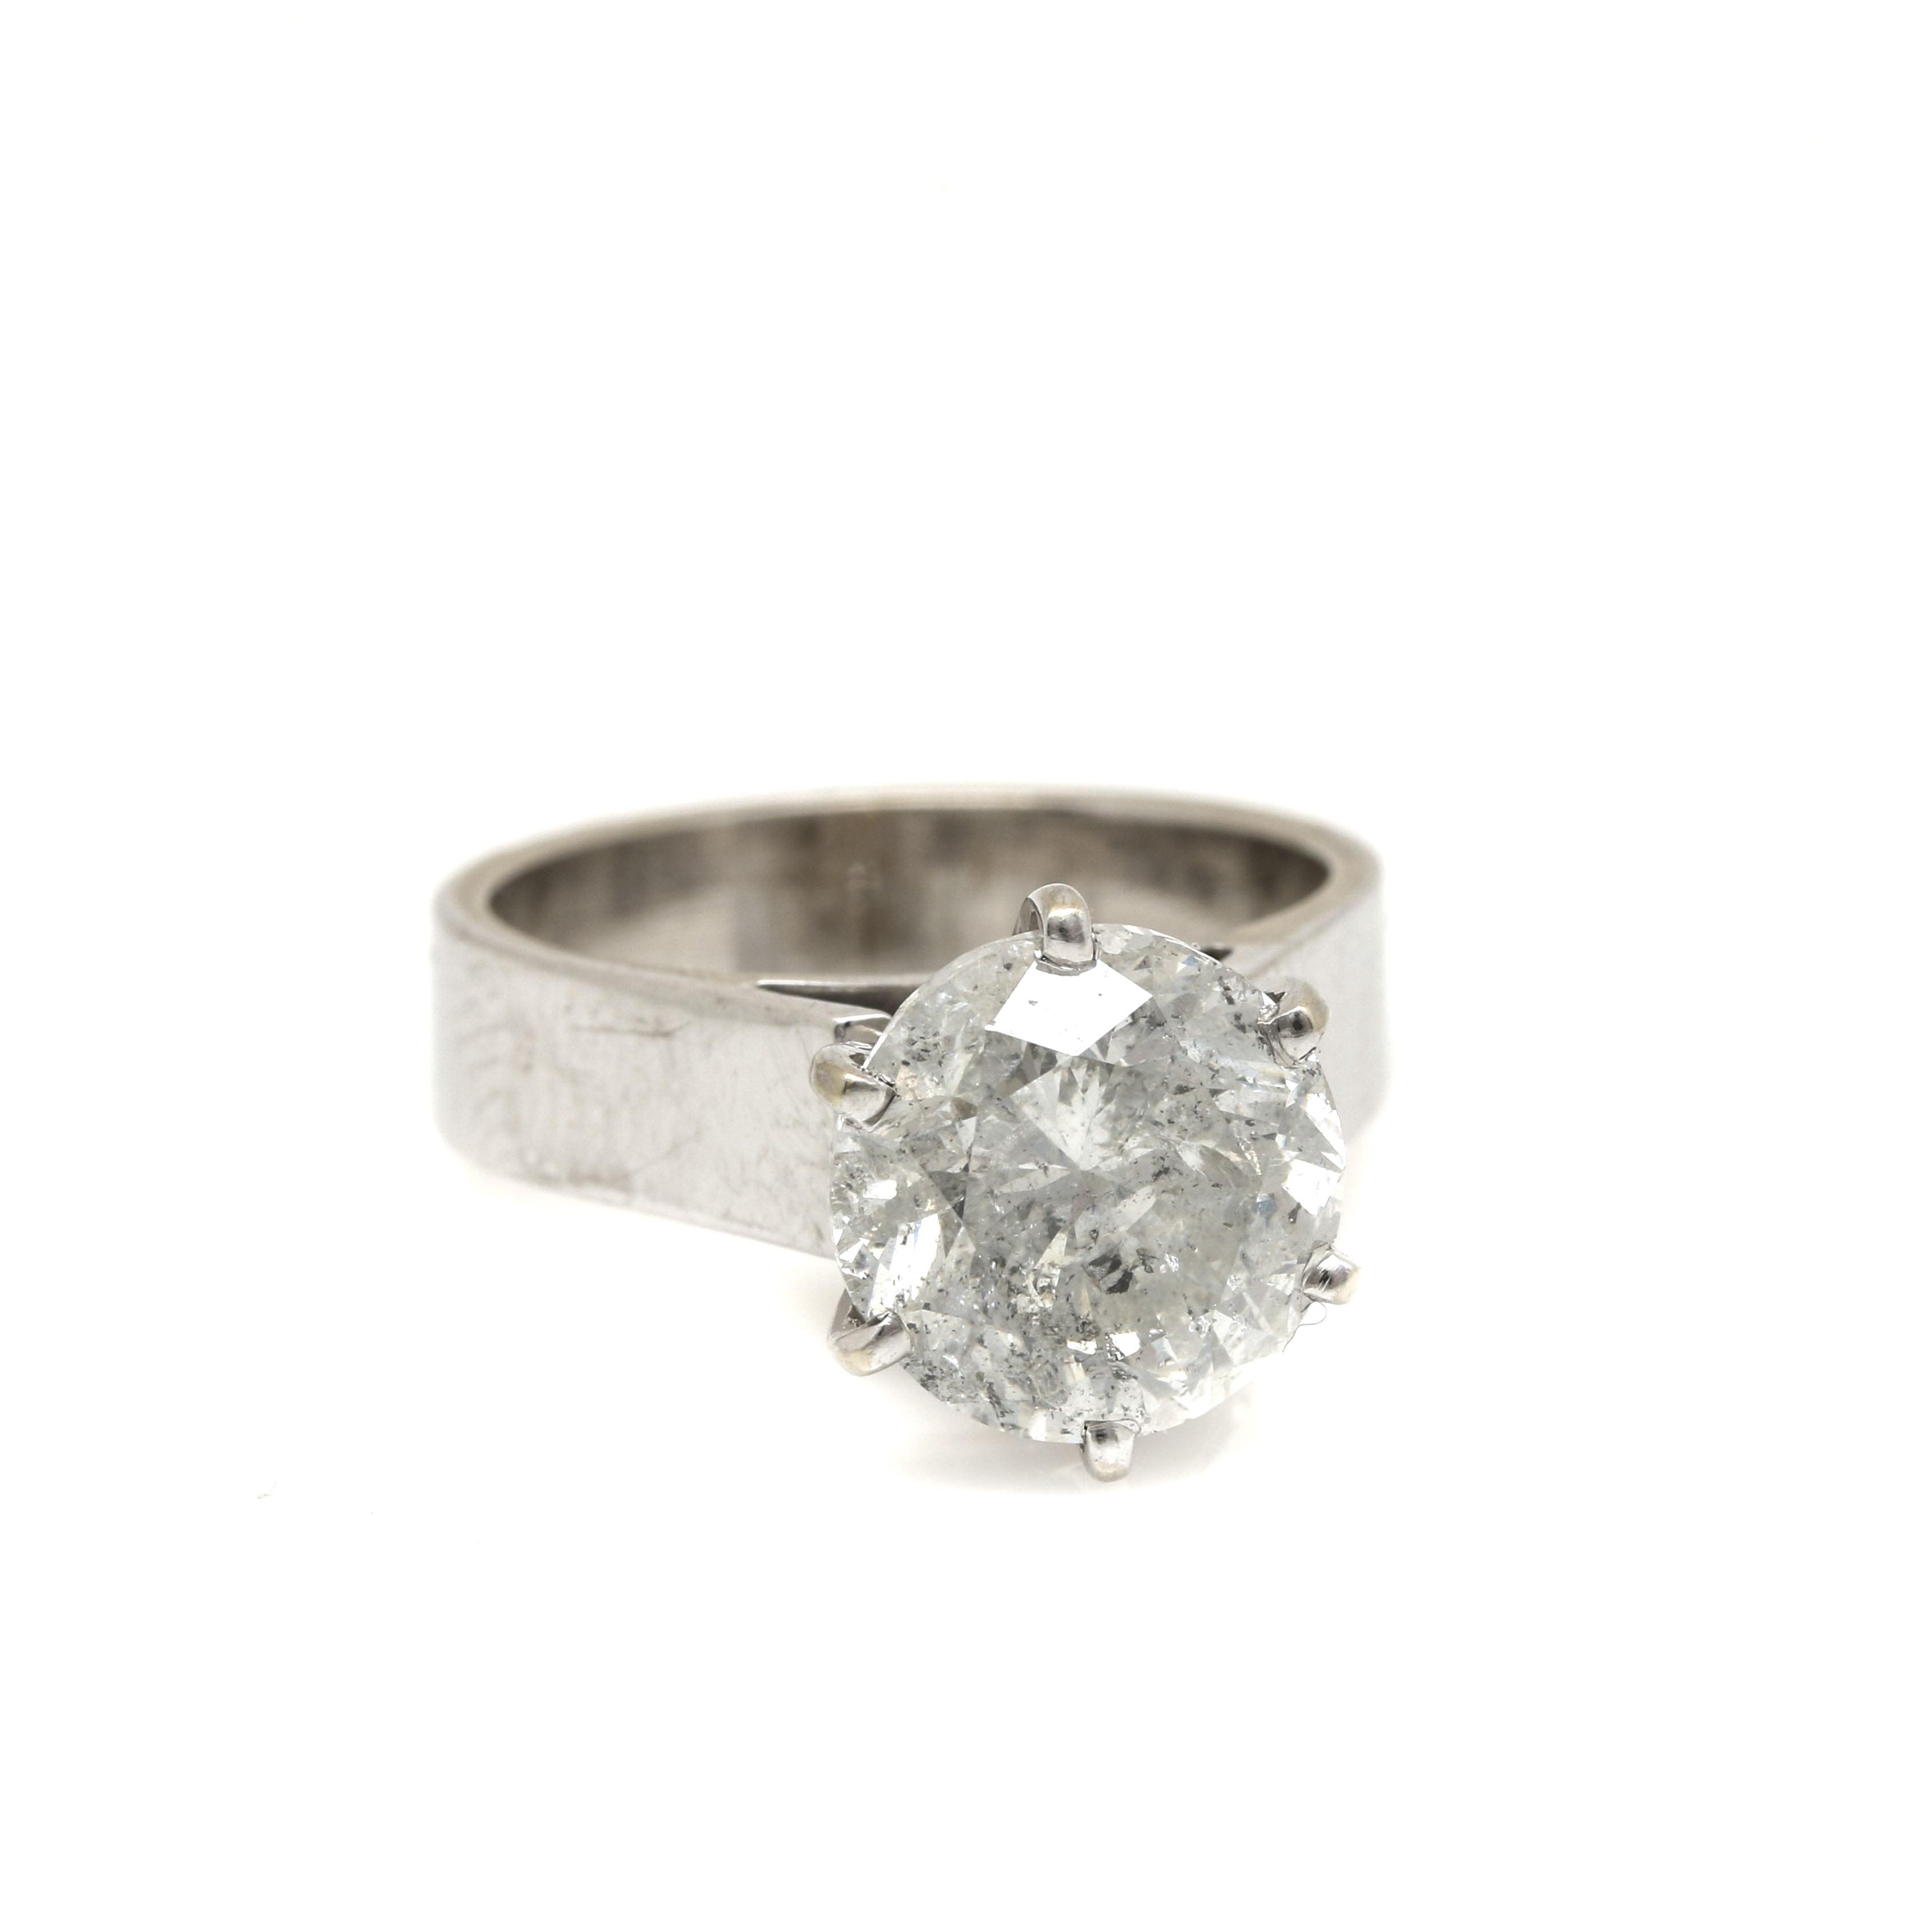 14K White Gold 3.54 CTW Diamond Ring